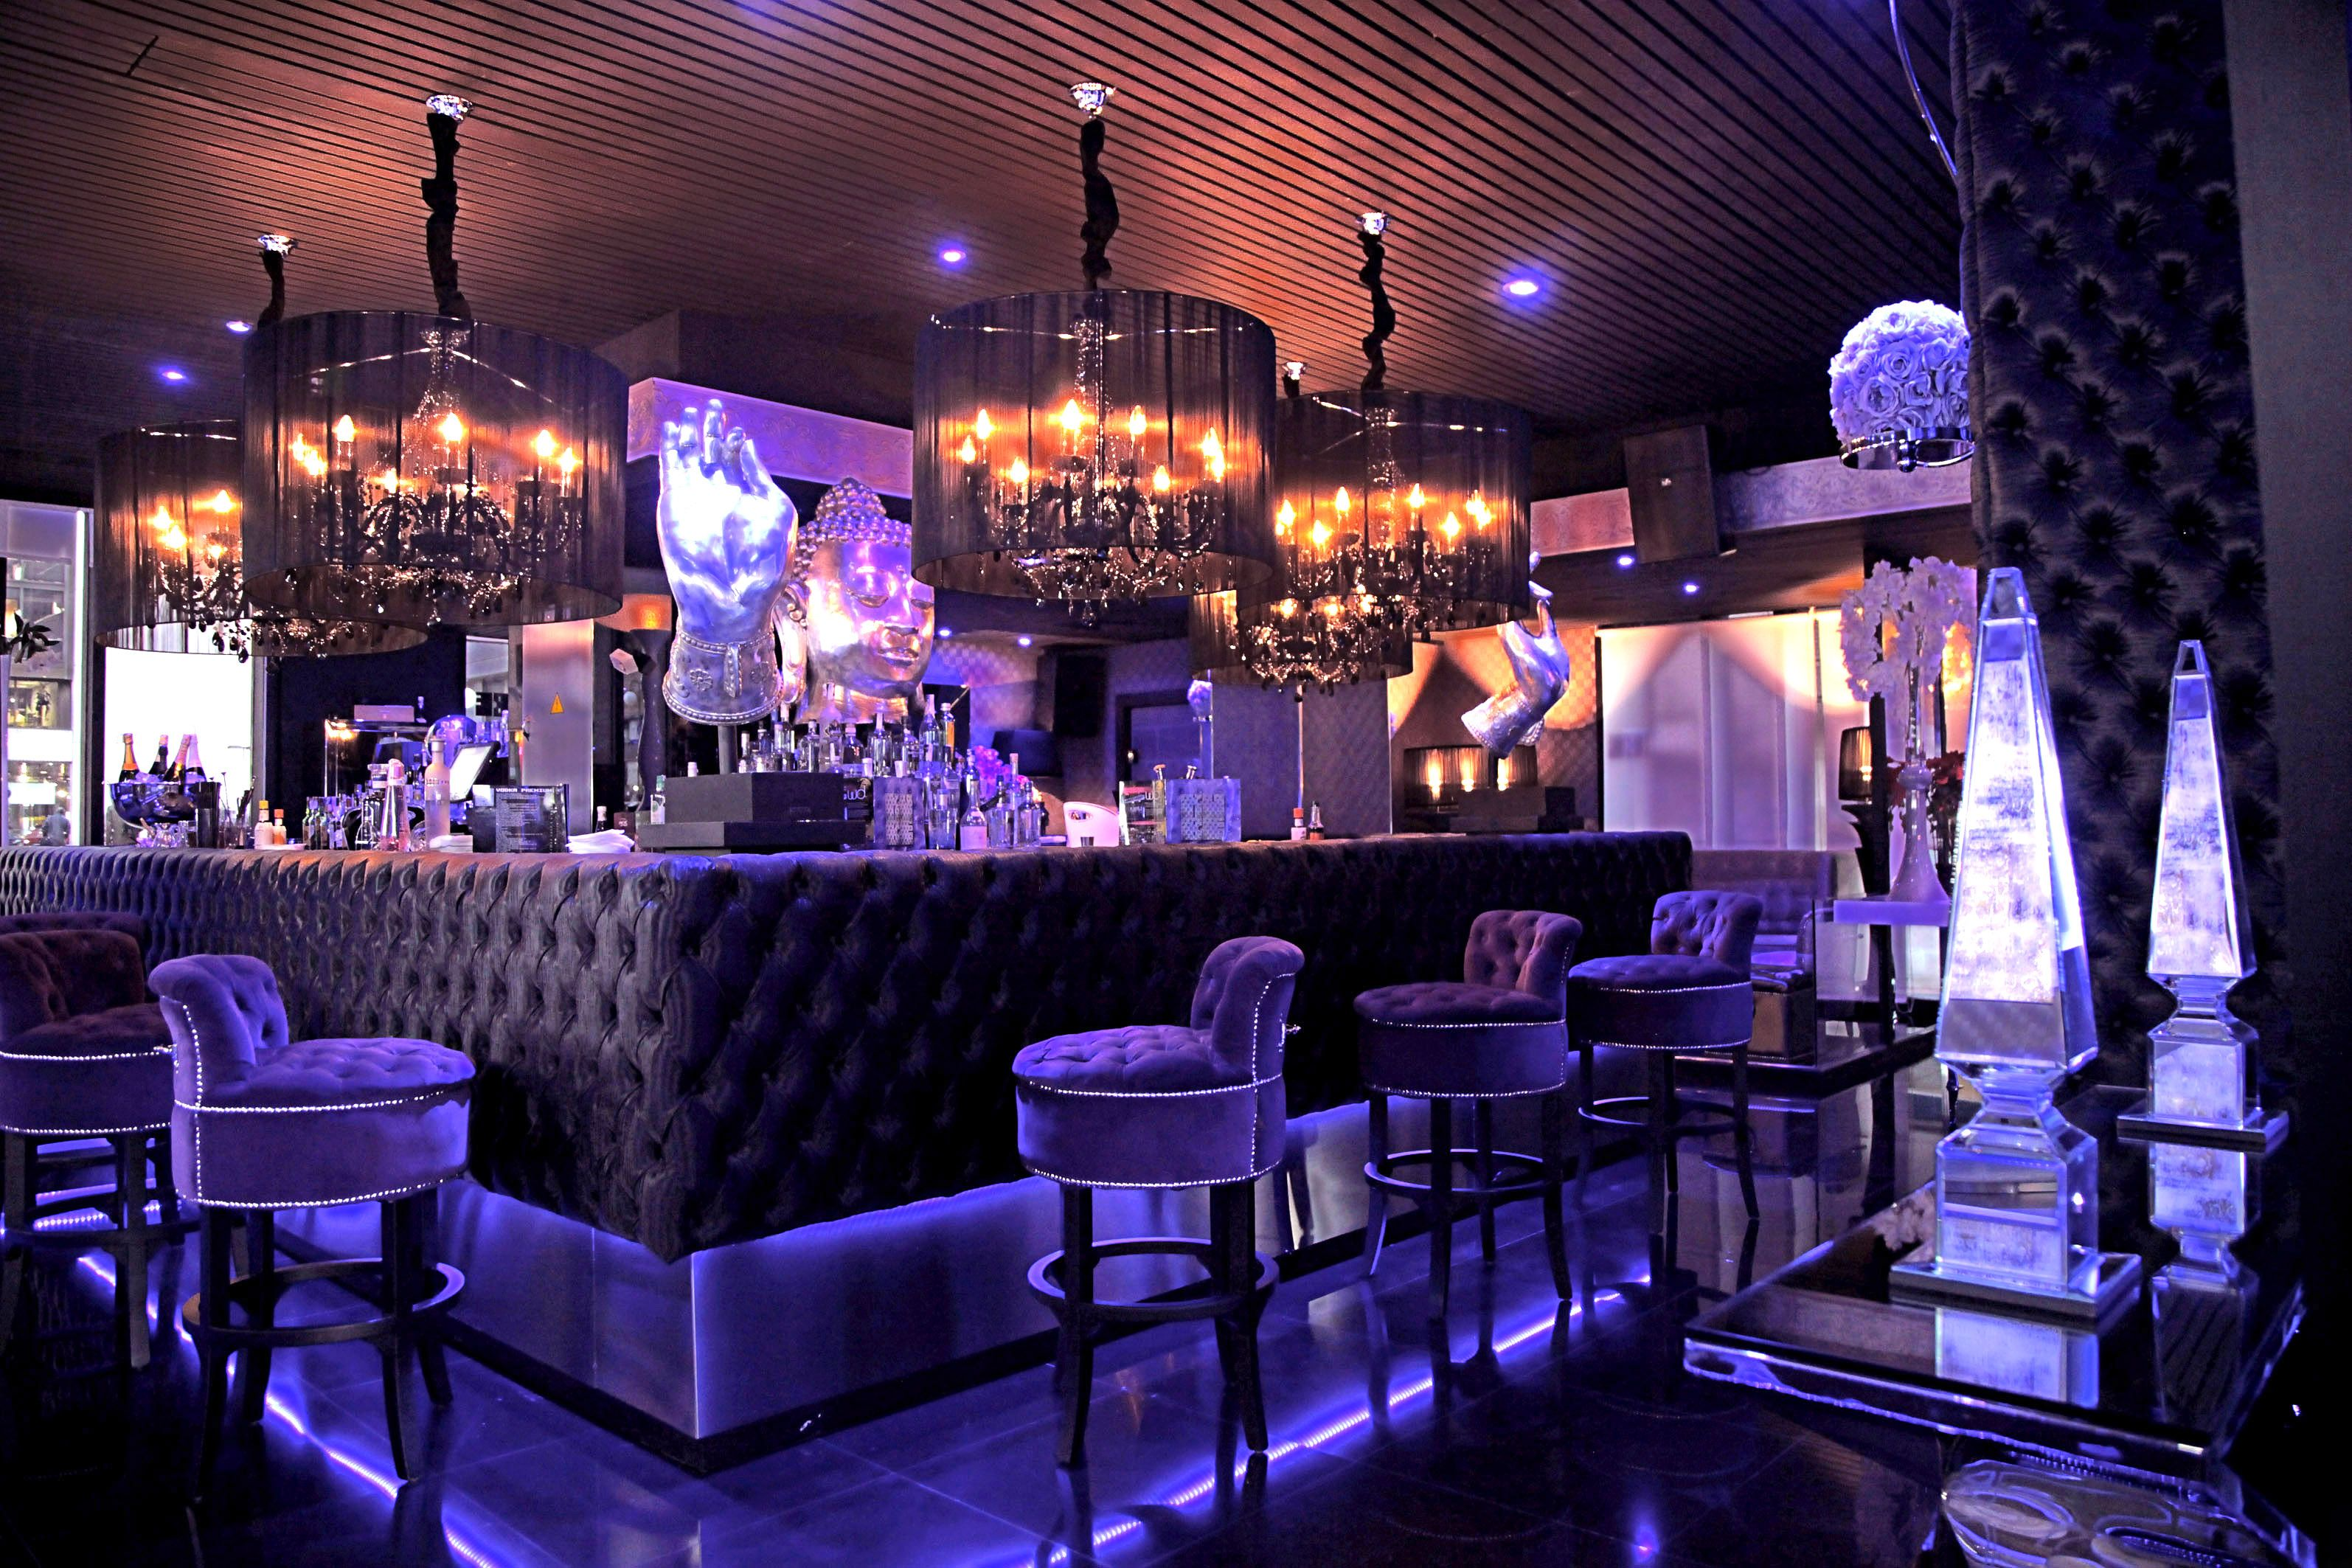 Newwd decoracion de bares tematicos kube madrid - Decoracion de pub ...